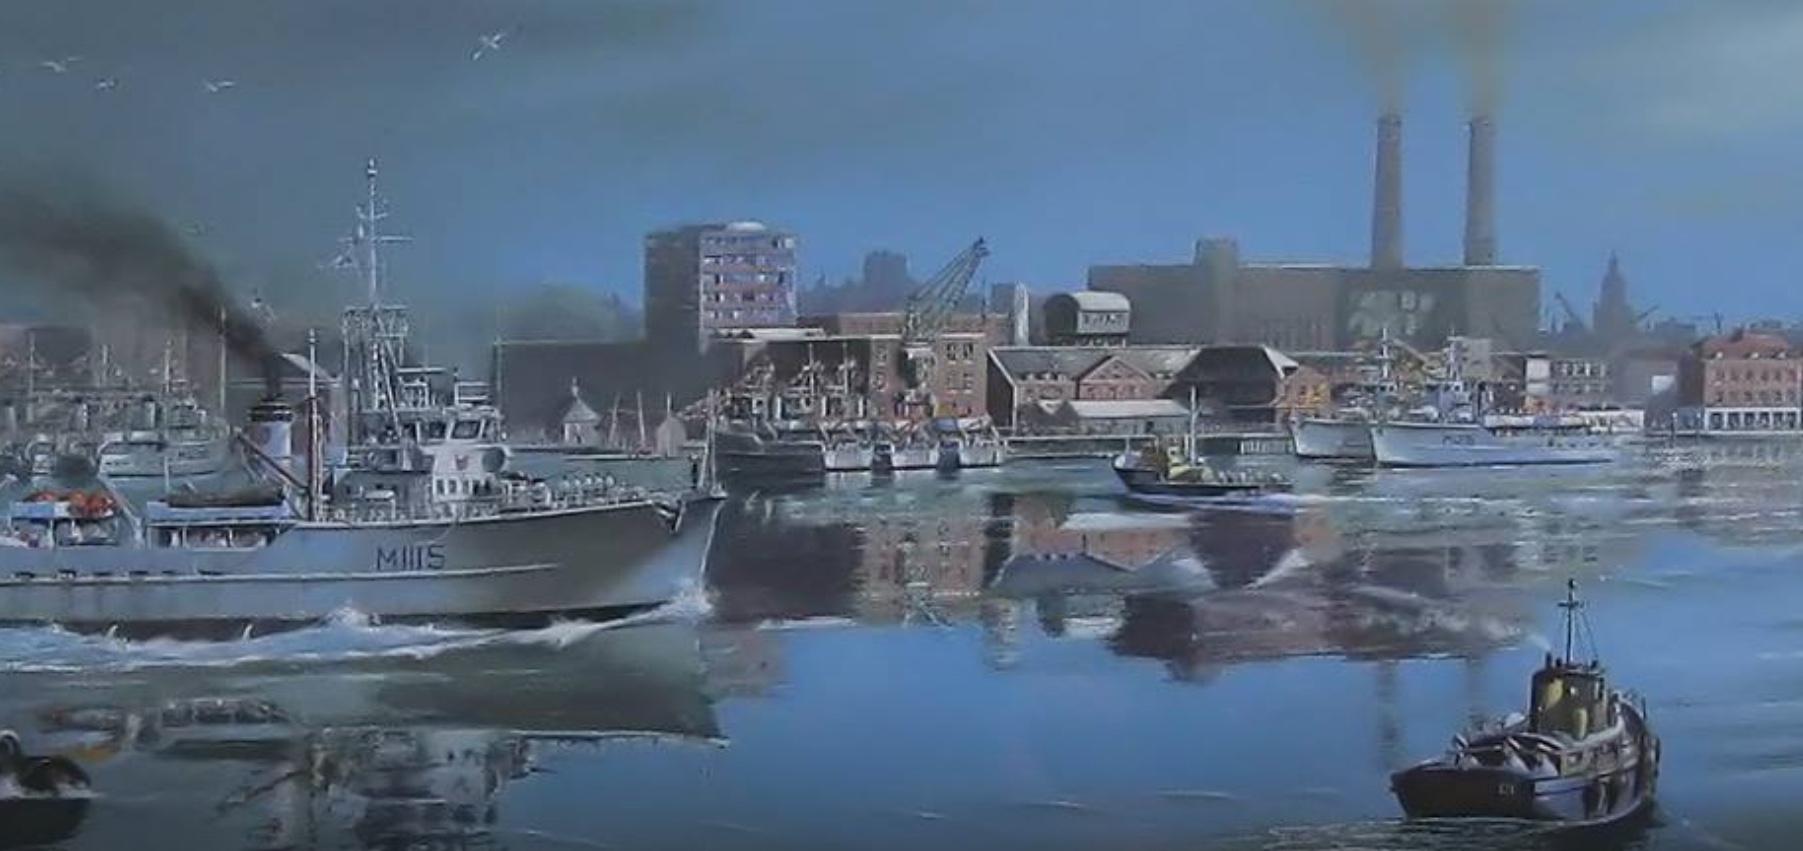 Vernon Creek painting detail.jpg